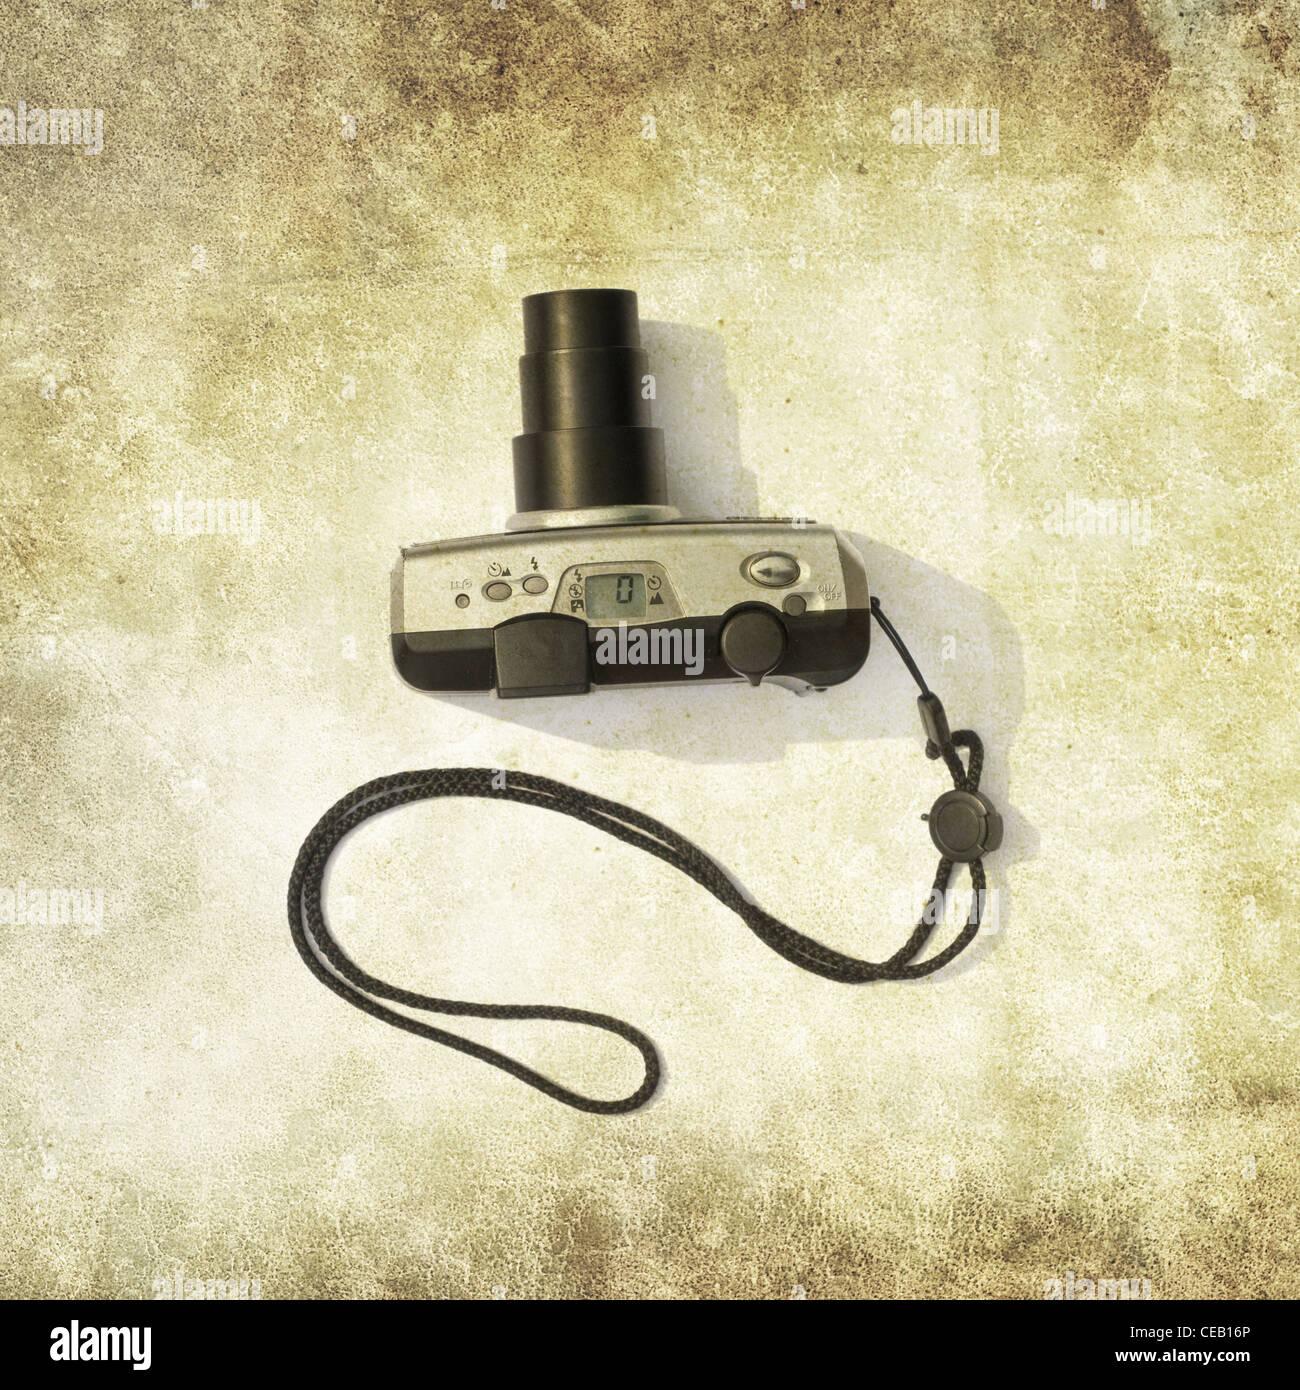 Zoom compacta cámara de cine Imagen De Stock